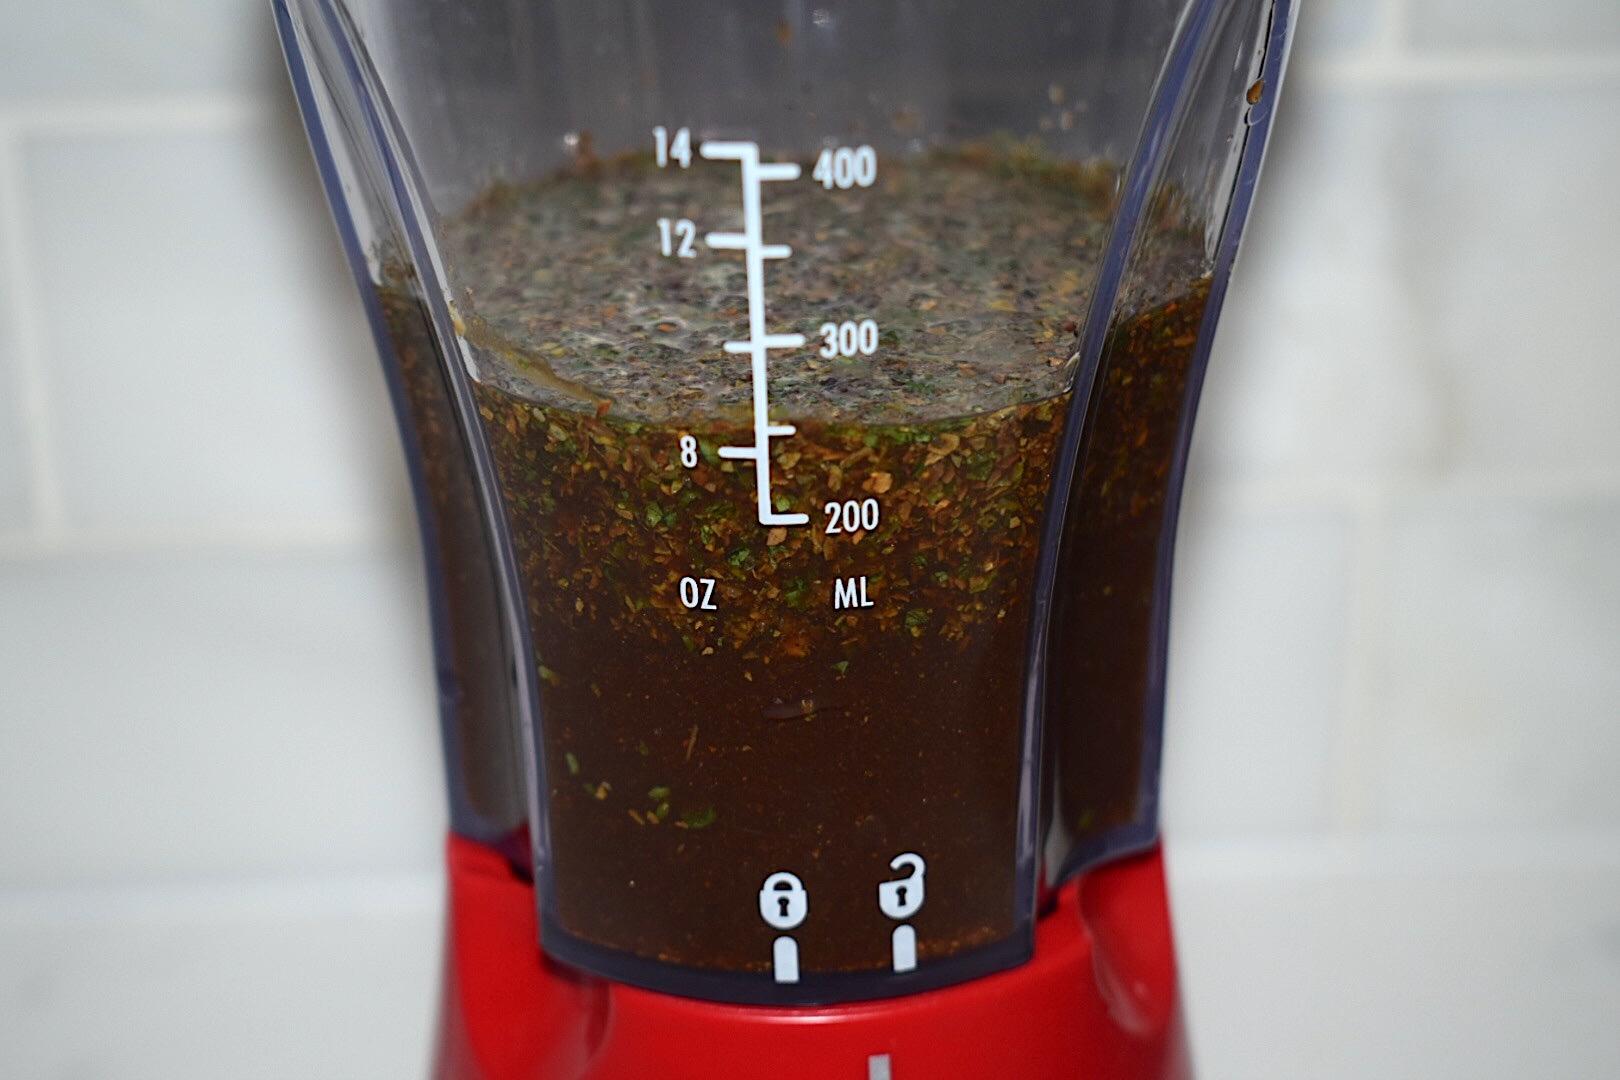 The best steak marinade ingredients in a red blender